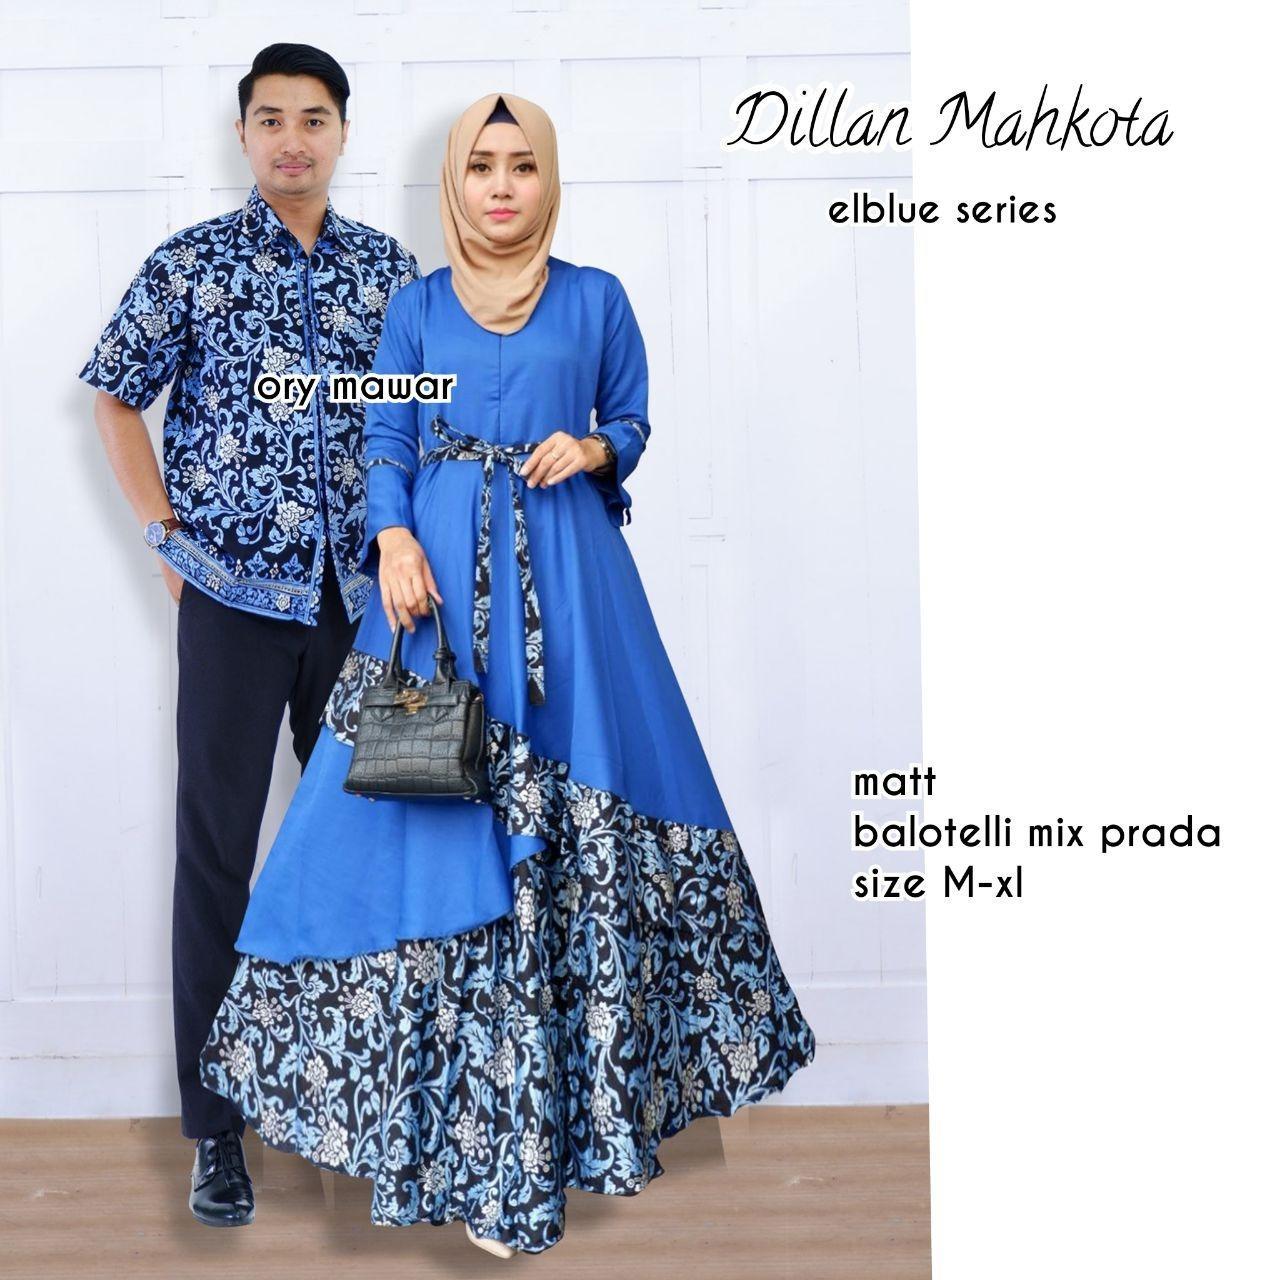 Termurah Baju Batik Couple Baju Muslim Wanita Terbaru 2018 Gamis Wanita Terbaru Batik Sarimbit Baju Batik Kondangan Hem Batik Batik